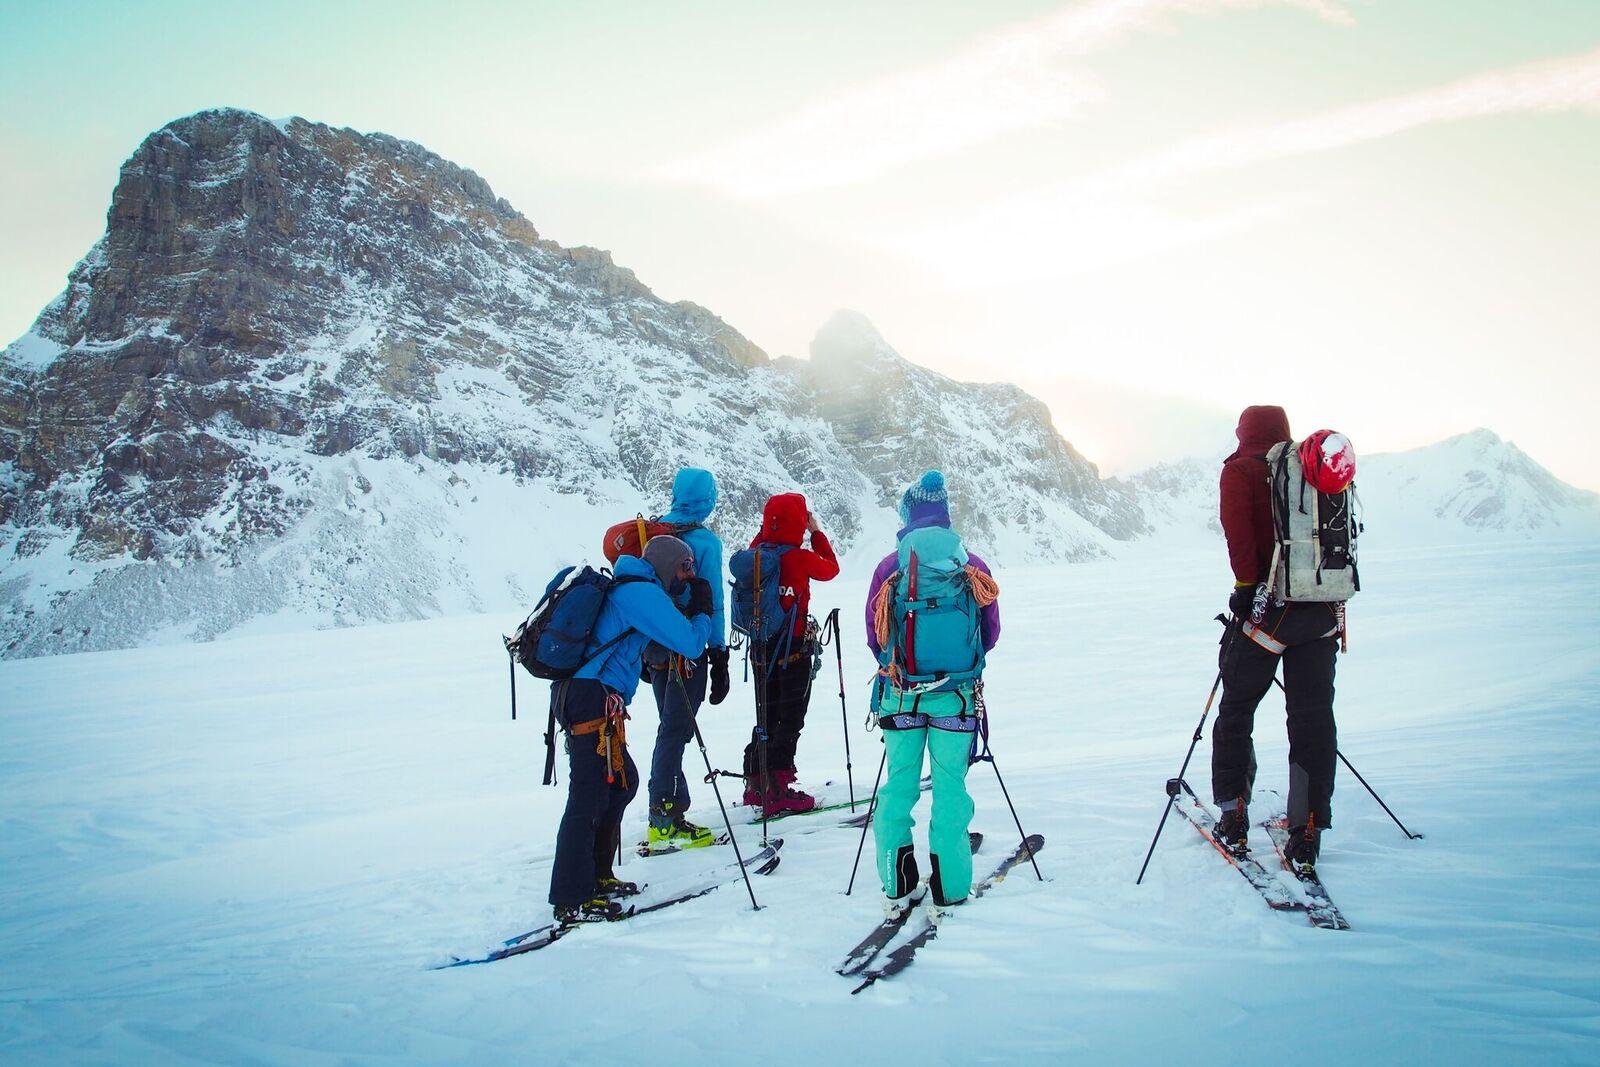 National Ski Mountaineering Team Members deciding which peak to ski up first. Photo: Matt Reid